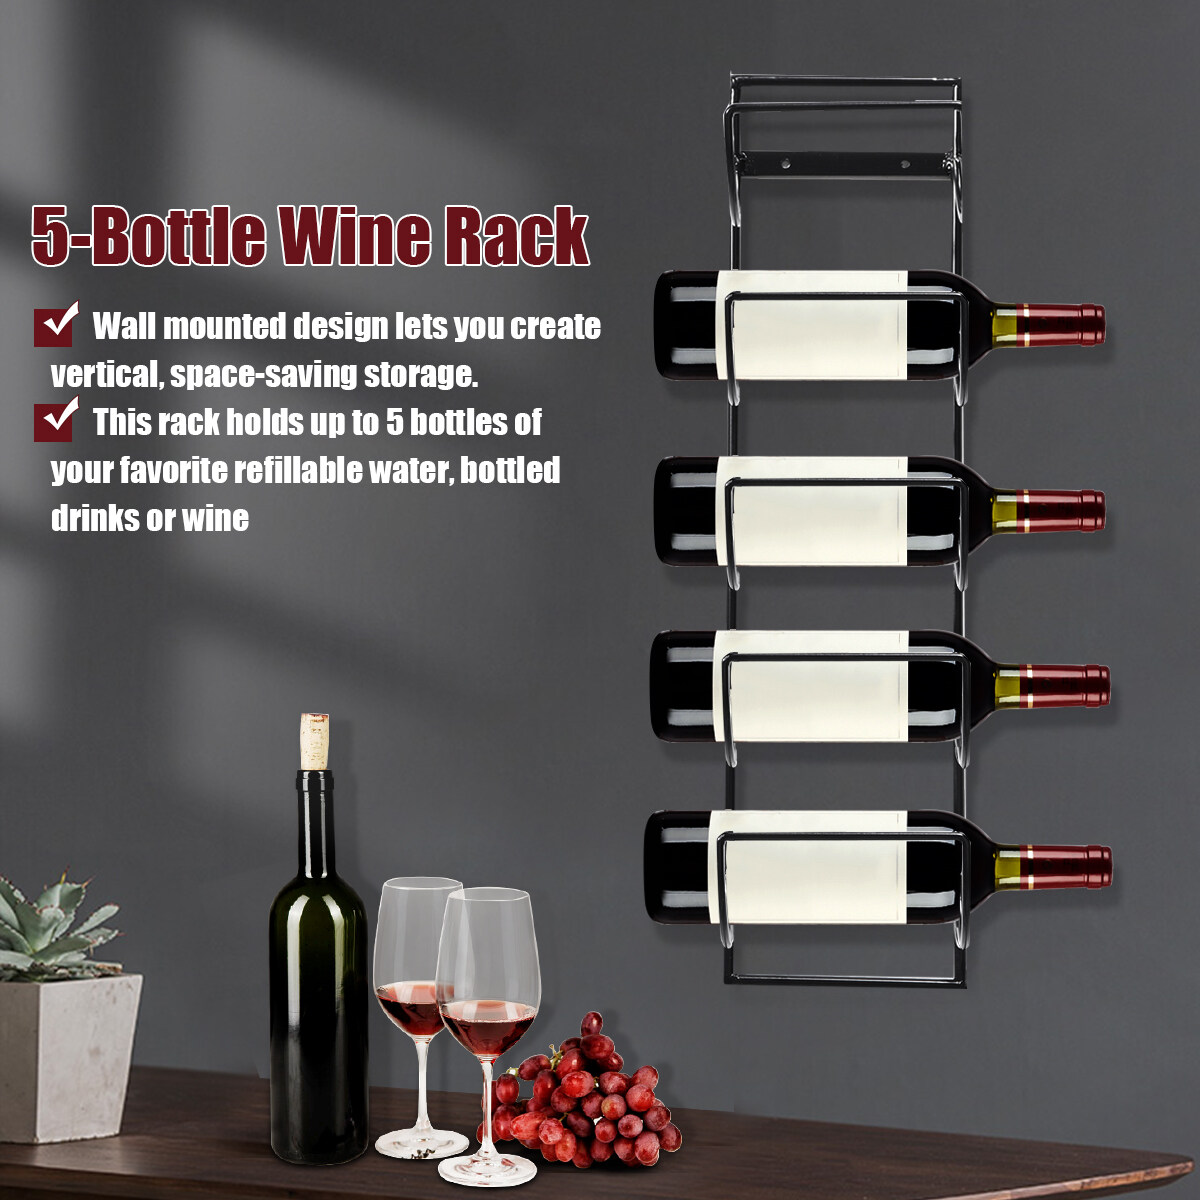 5 Bottle Wine Rack Black Metal Wall Mounted Storage Holder Shelf Kitchen Vine Lazada Ph